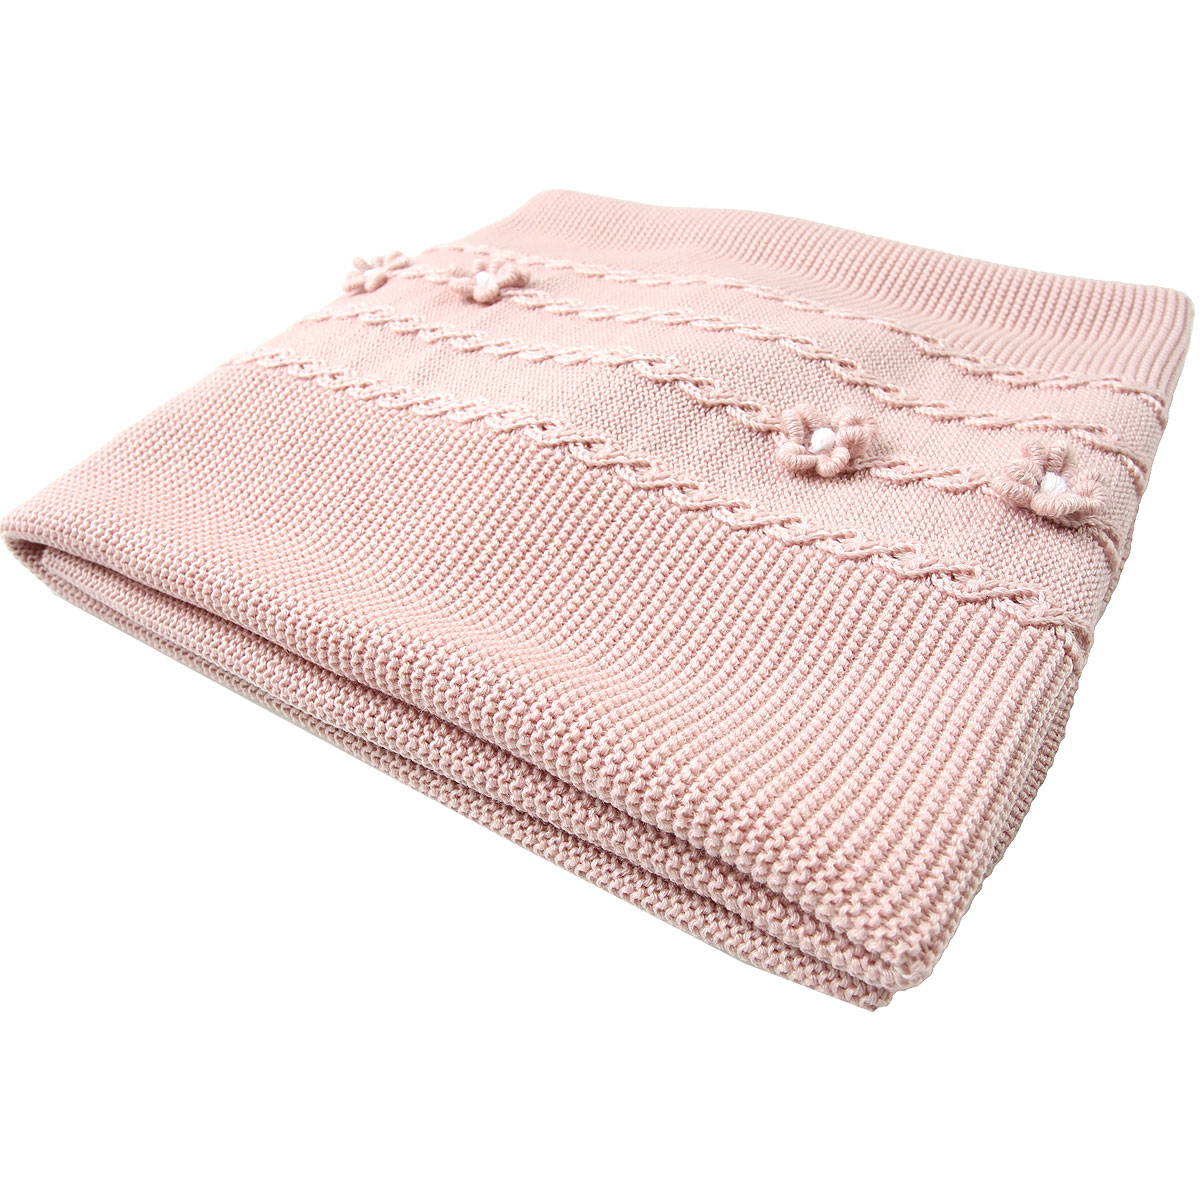 Marlu Baby Bodysuits & Onesies for Girls On Sale, Antique Rose, Wool, 2019